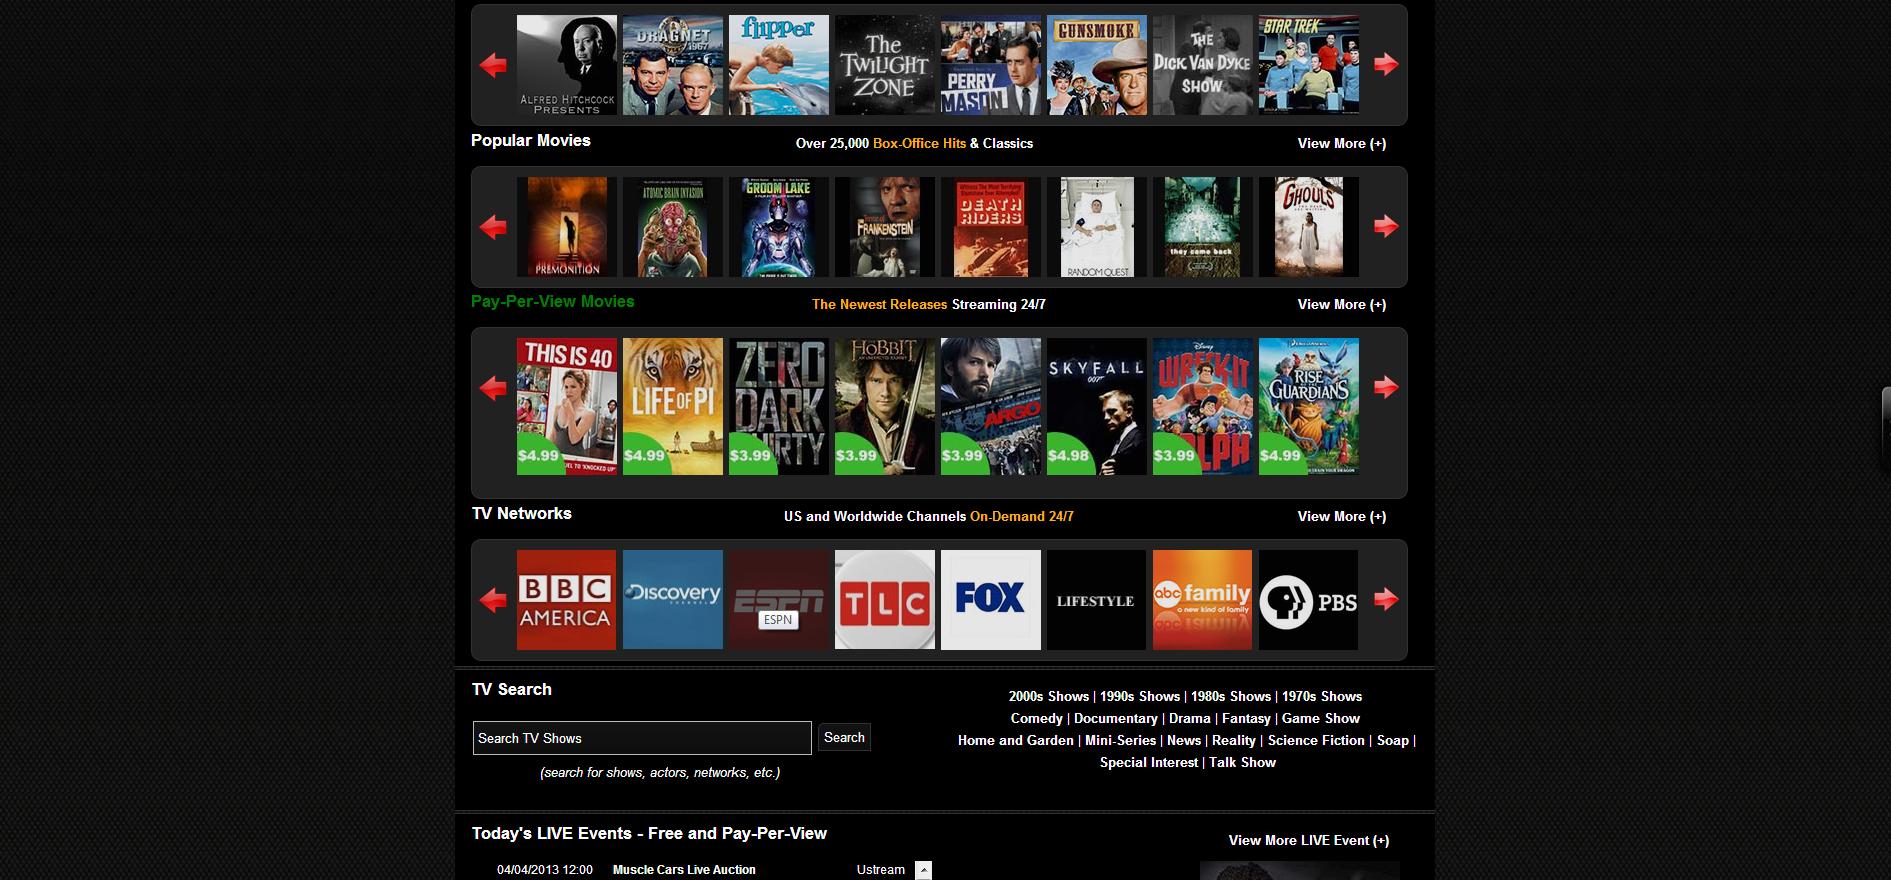 Online Video Content: Aereo or Rabbit TV   Rabbit TV Reviews